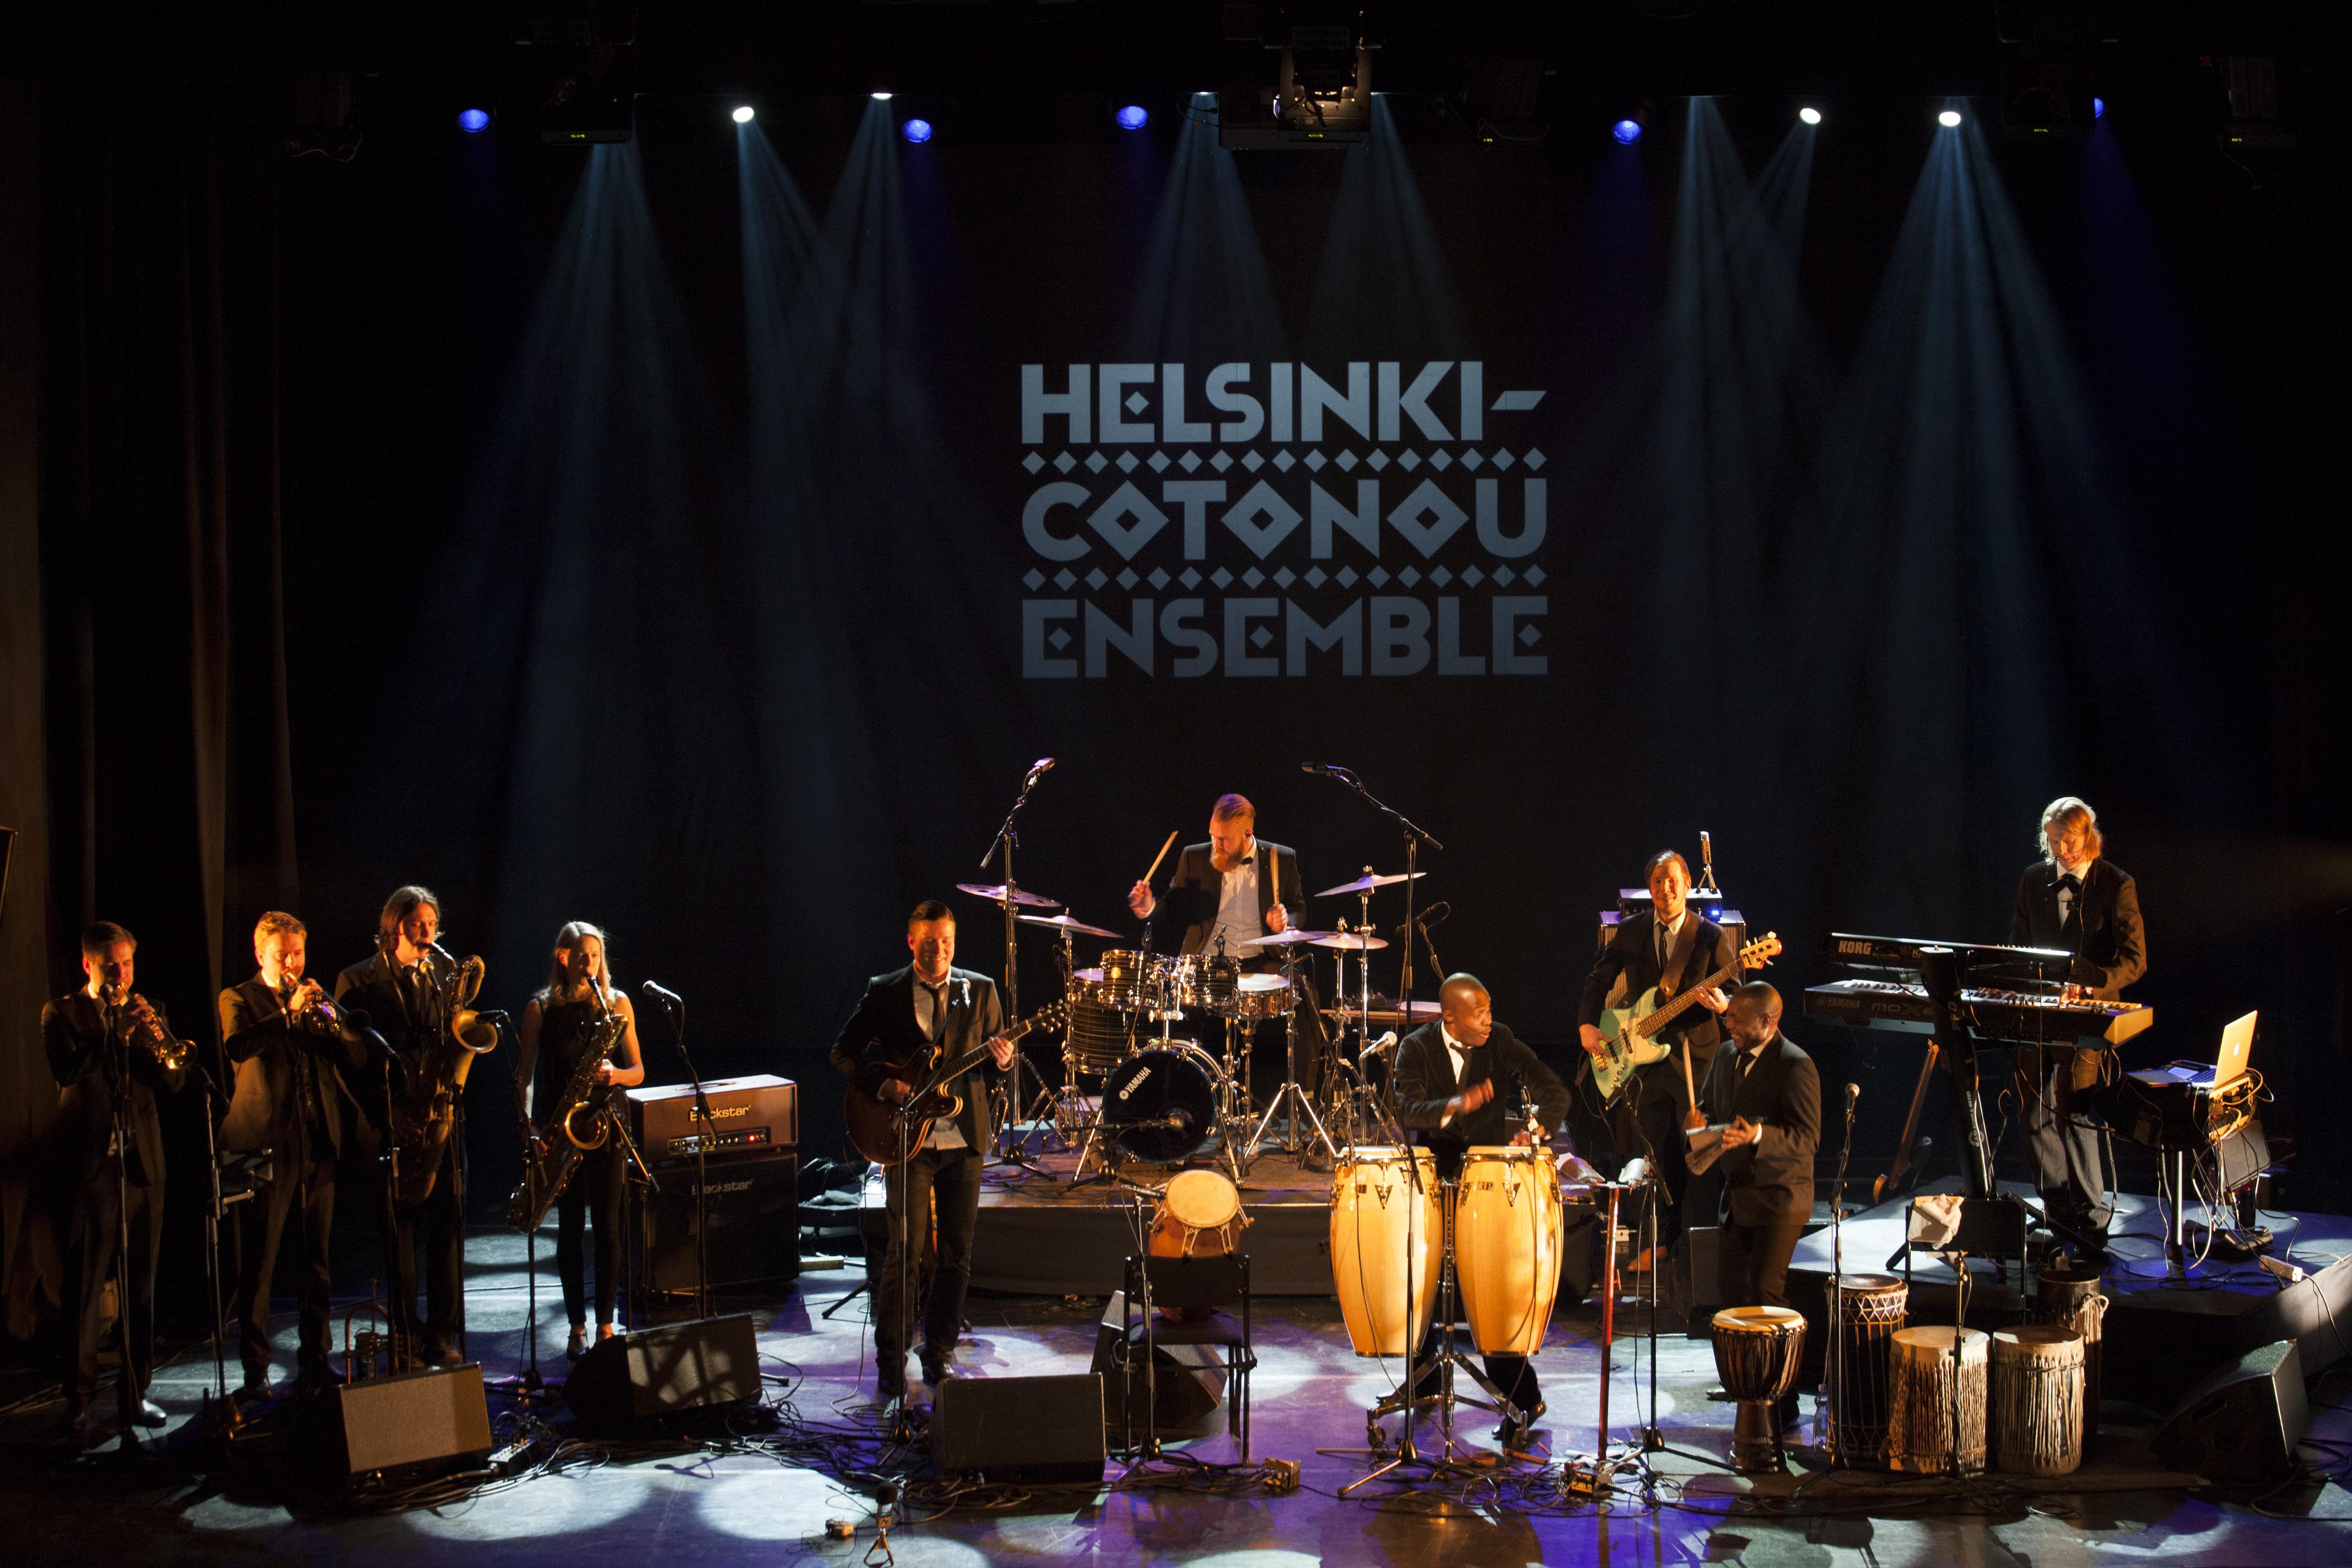 Rock Paper Scissors - Helsinki-Cotonou Ensemble - Finn-Funky